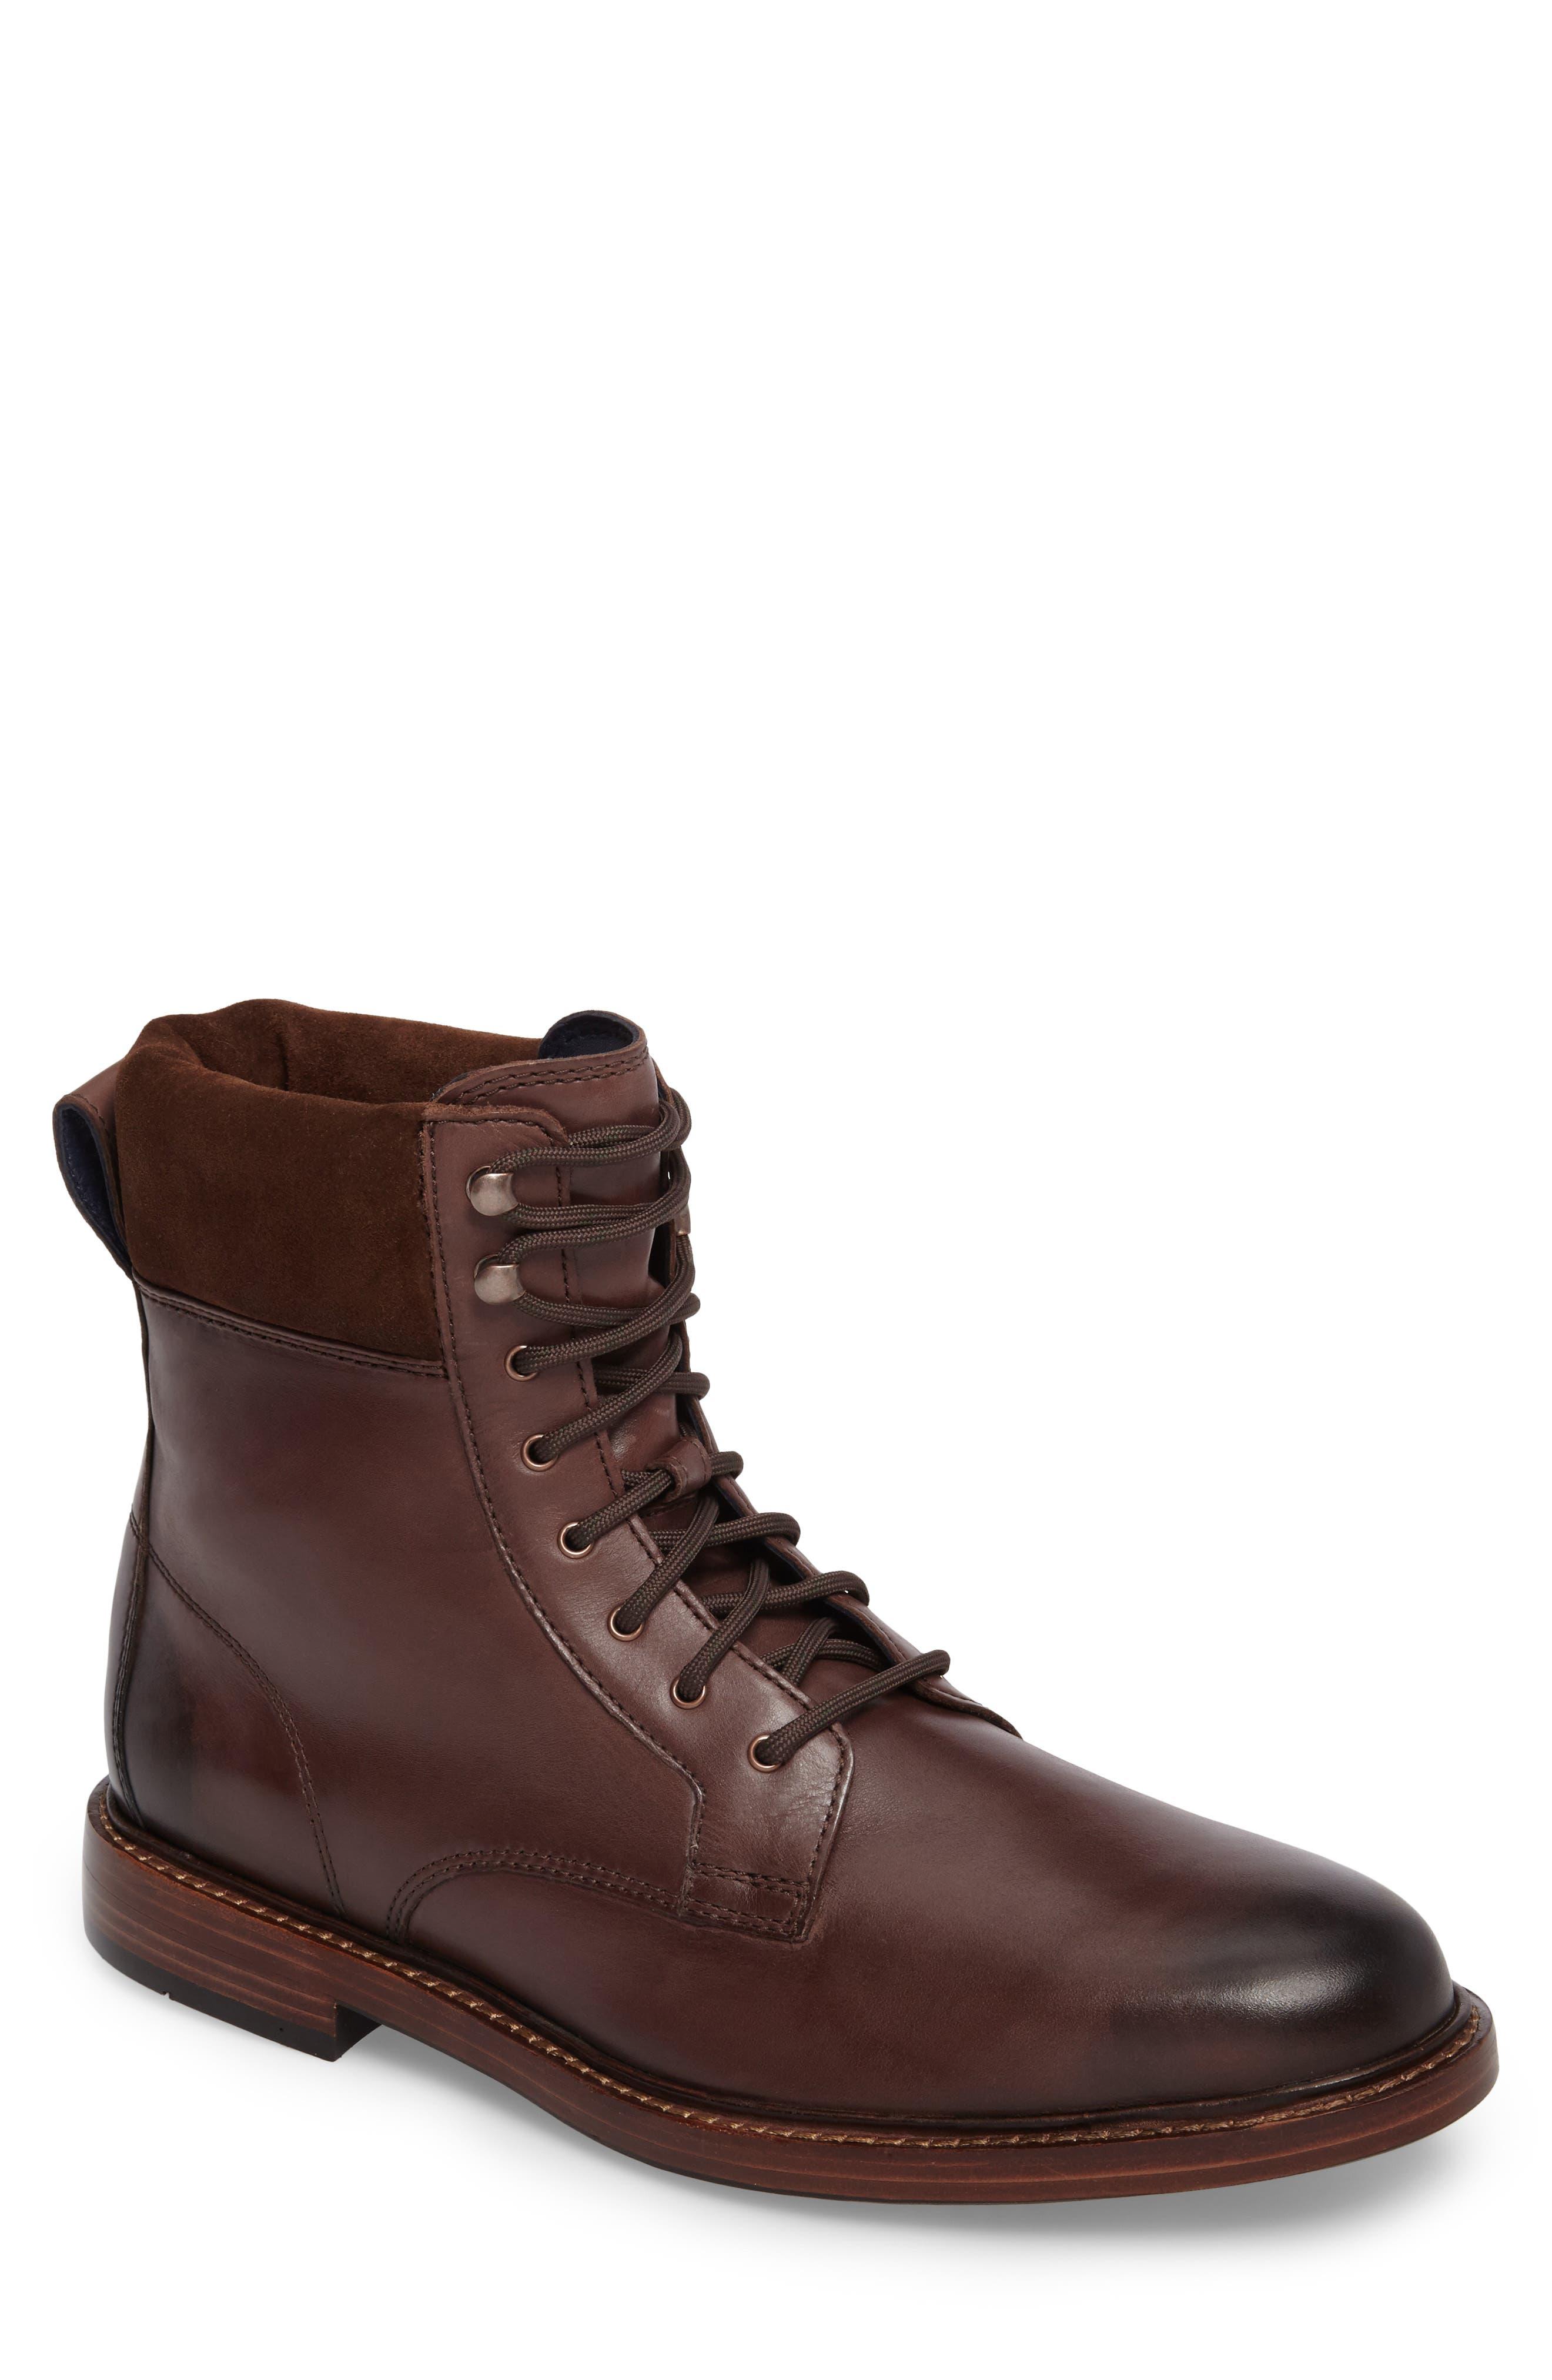 Tyler Grand Plain Toe Boot, Main, color, 205